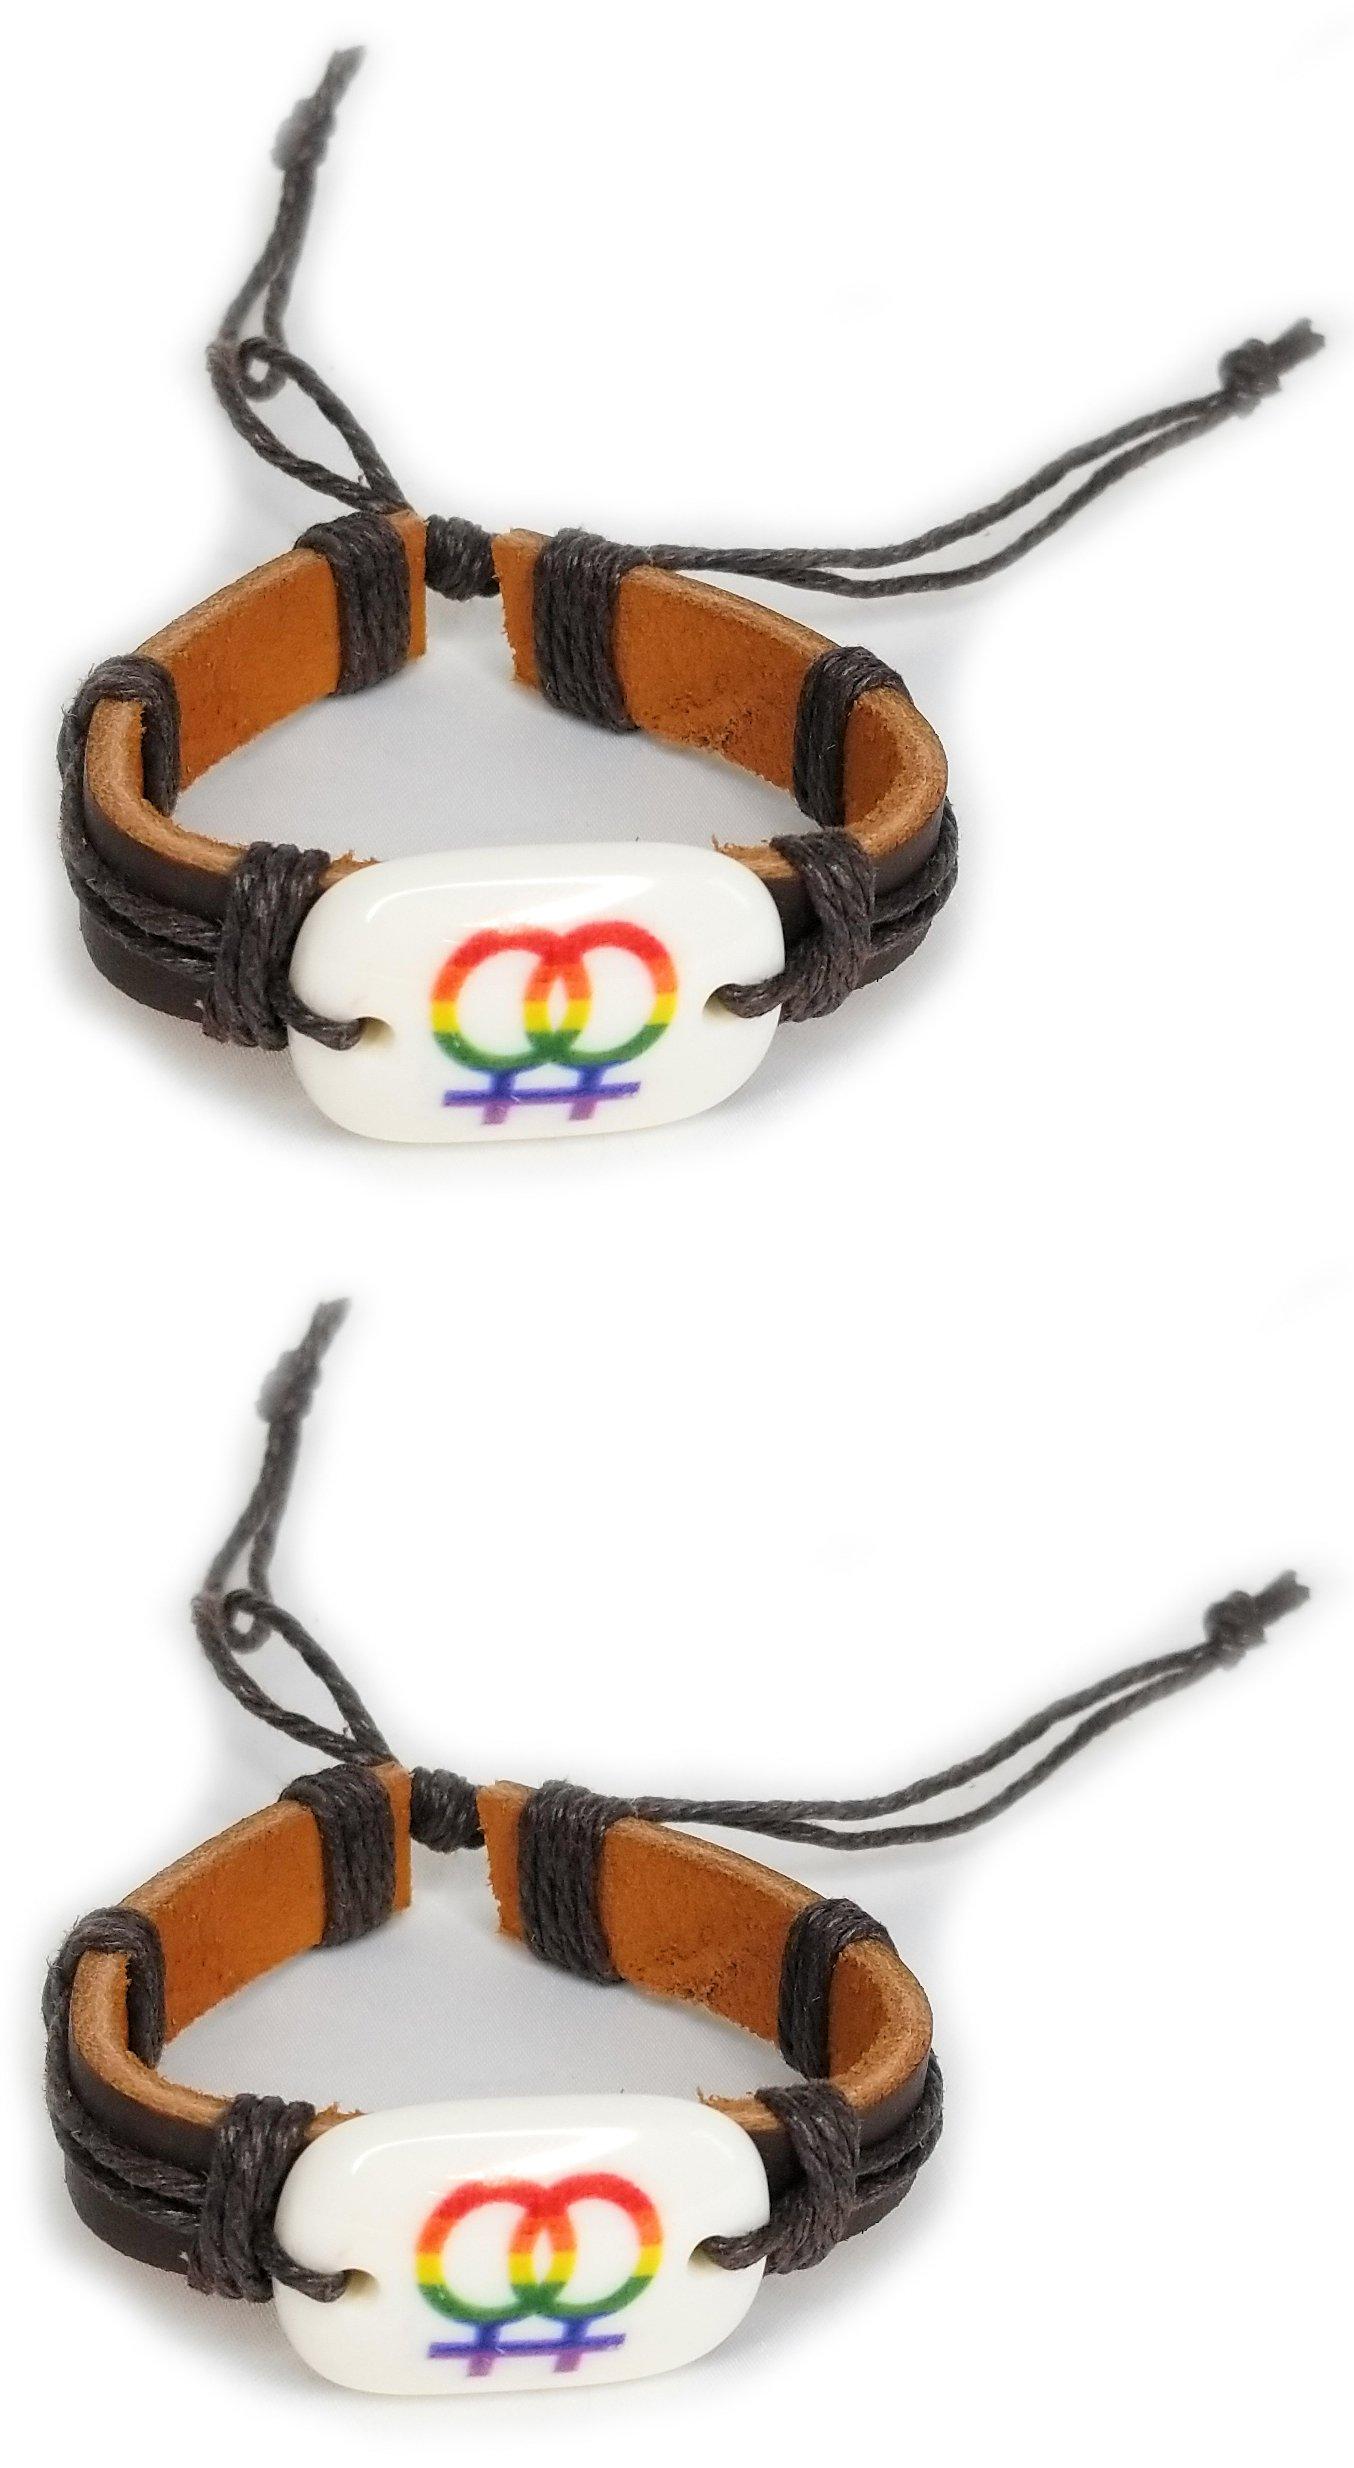 RPI Cute LGBT Lesbian Bracelete Cuff, Rainbow Gay Pride Lesbian Love Bracelet for Her (Two Brown)